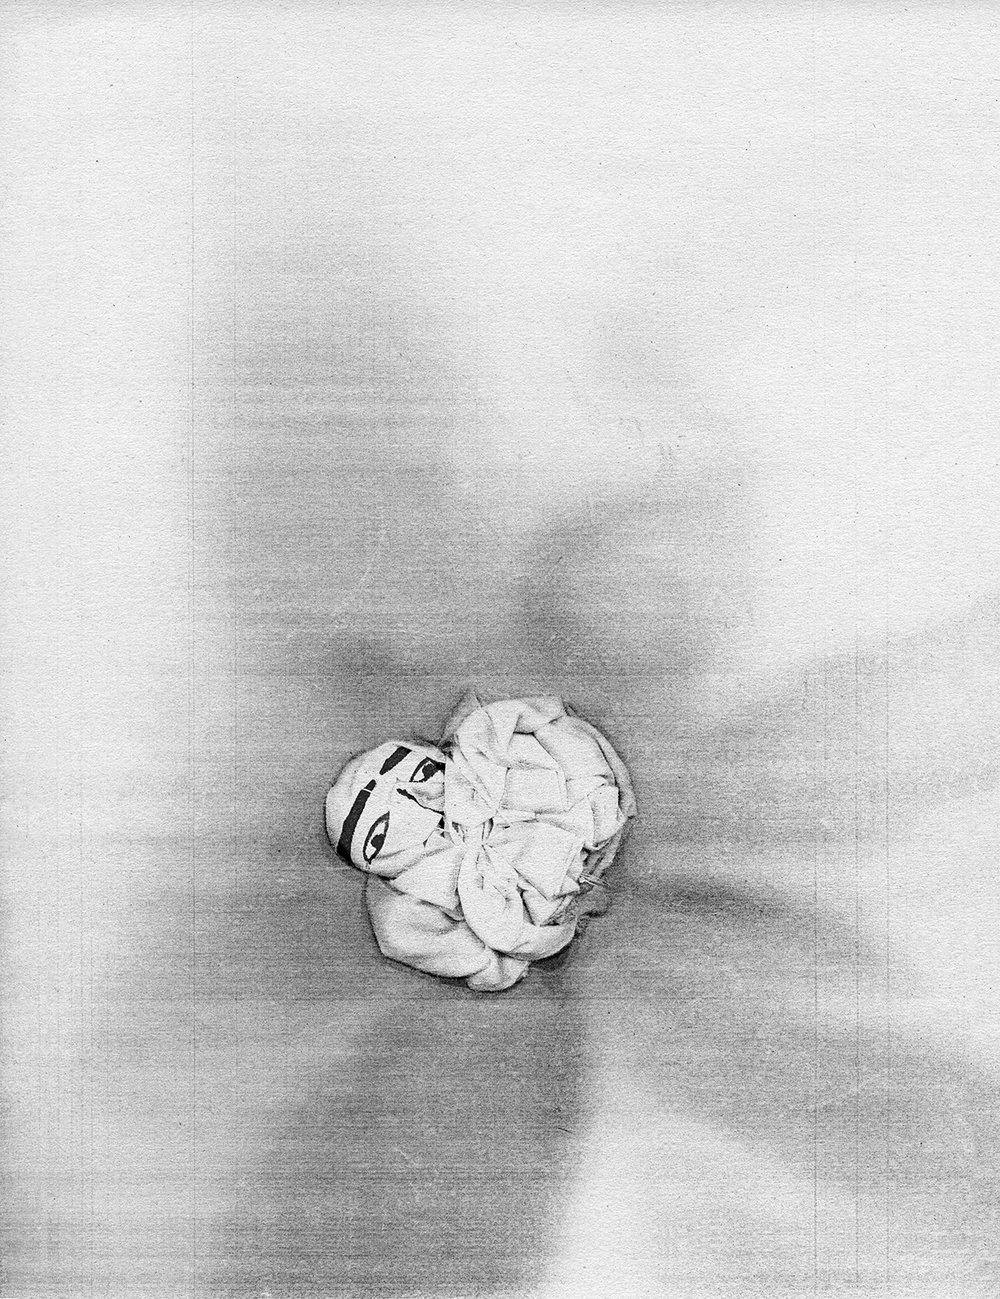 Human Imperfections - Mr. Big Head 6